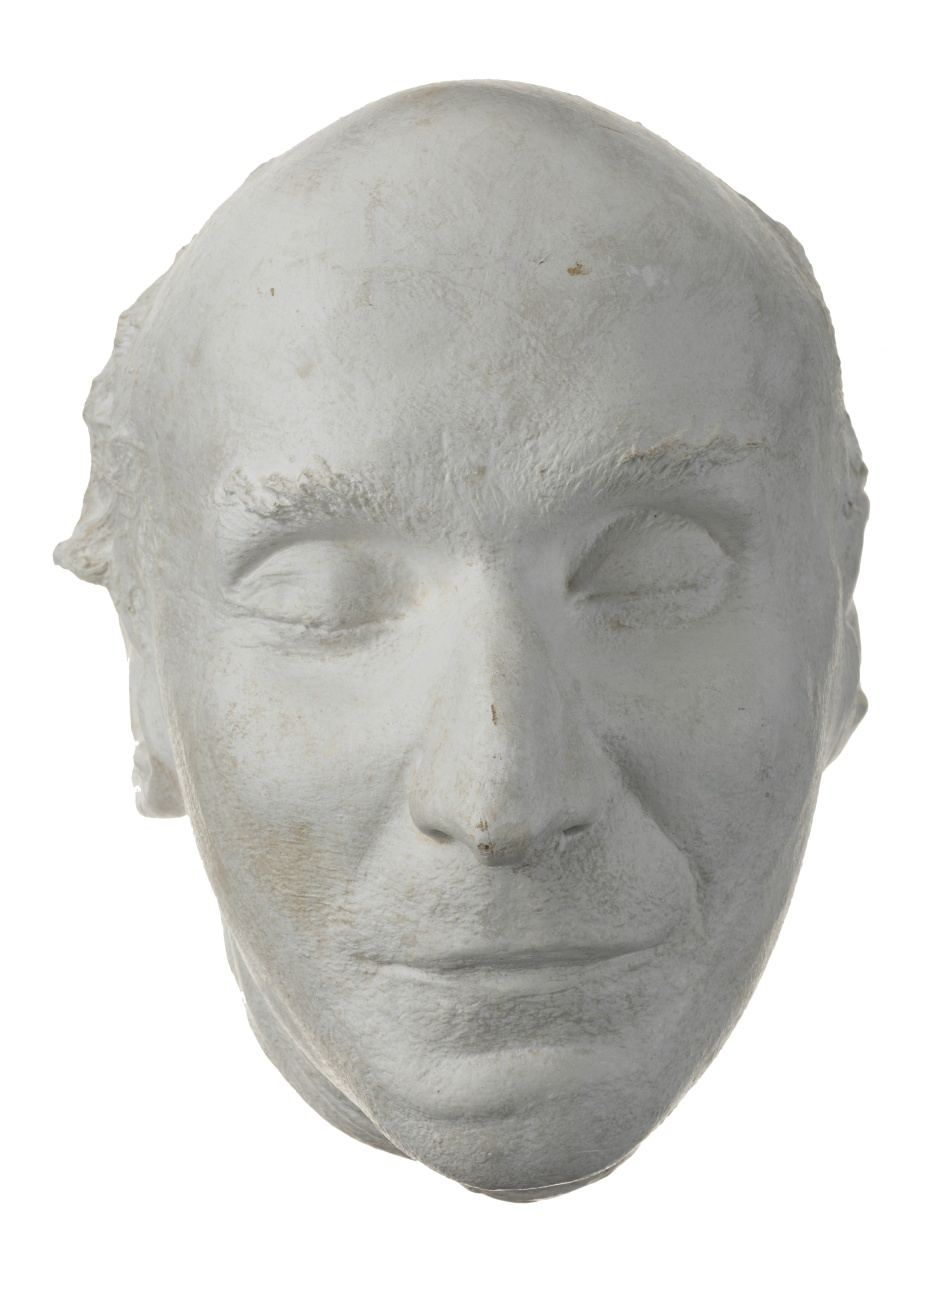 Posmrtná maska spisovatele Oskara Bauma (1883–1941)